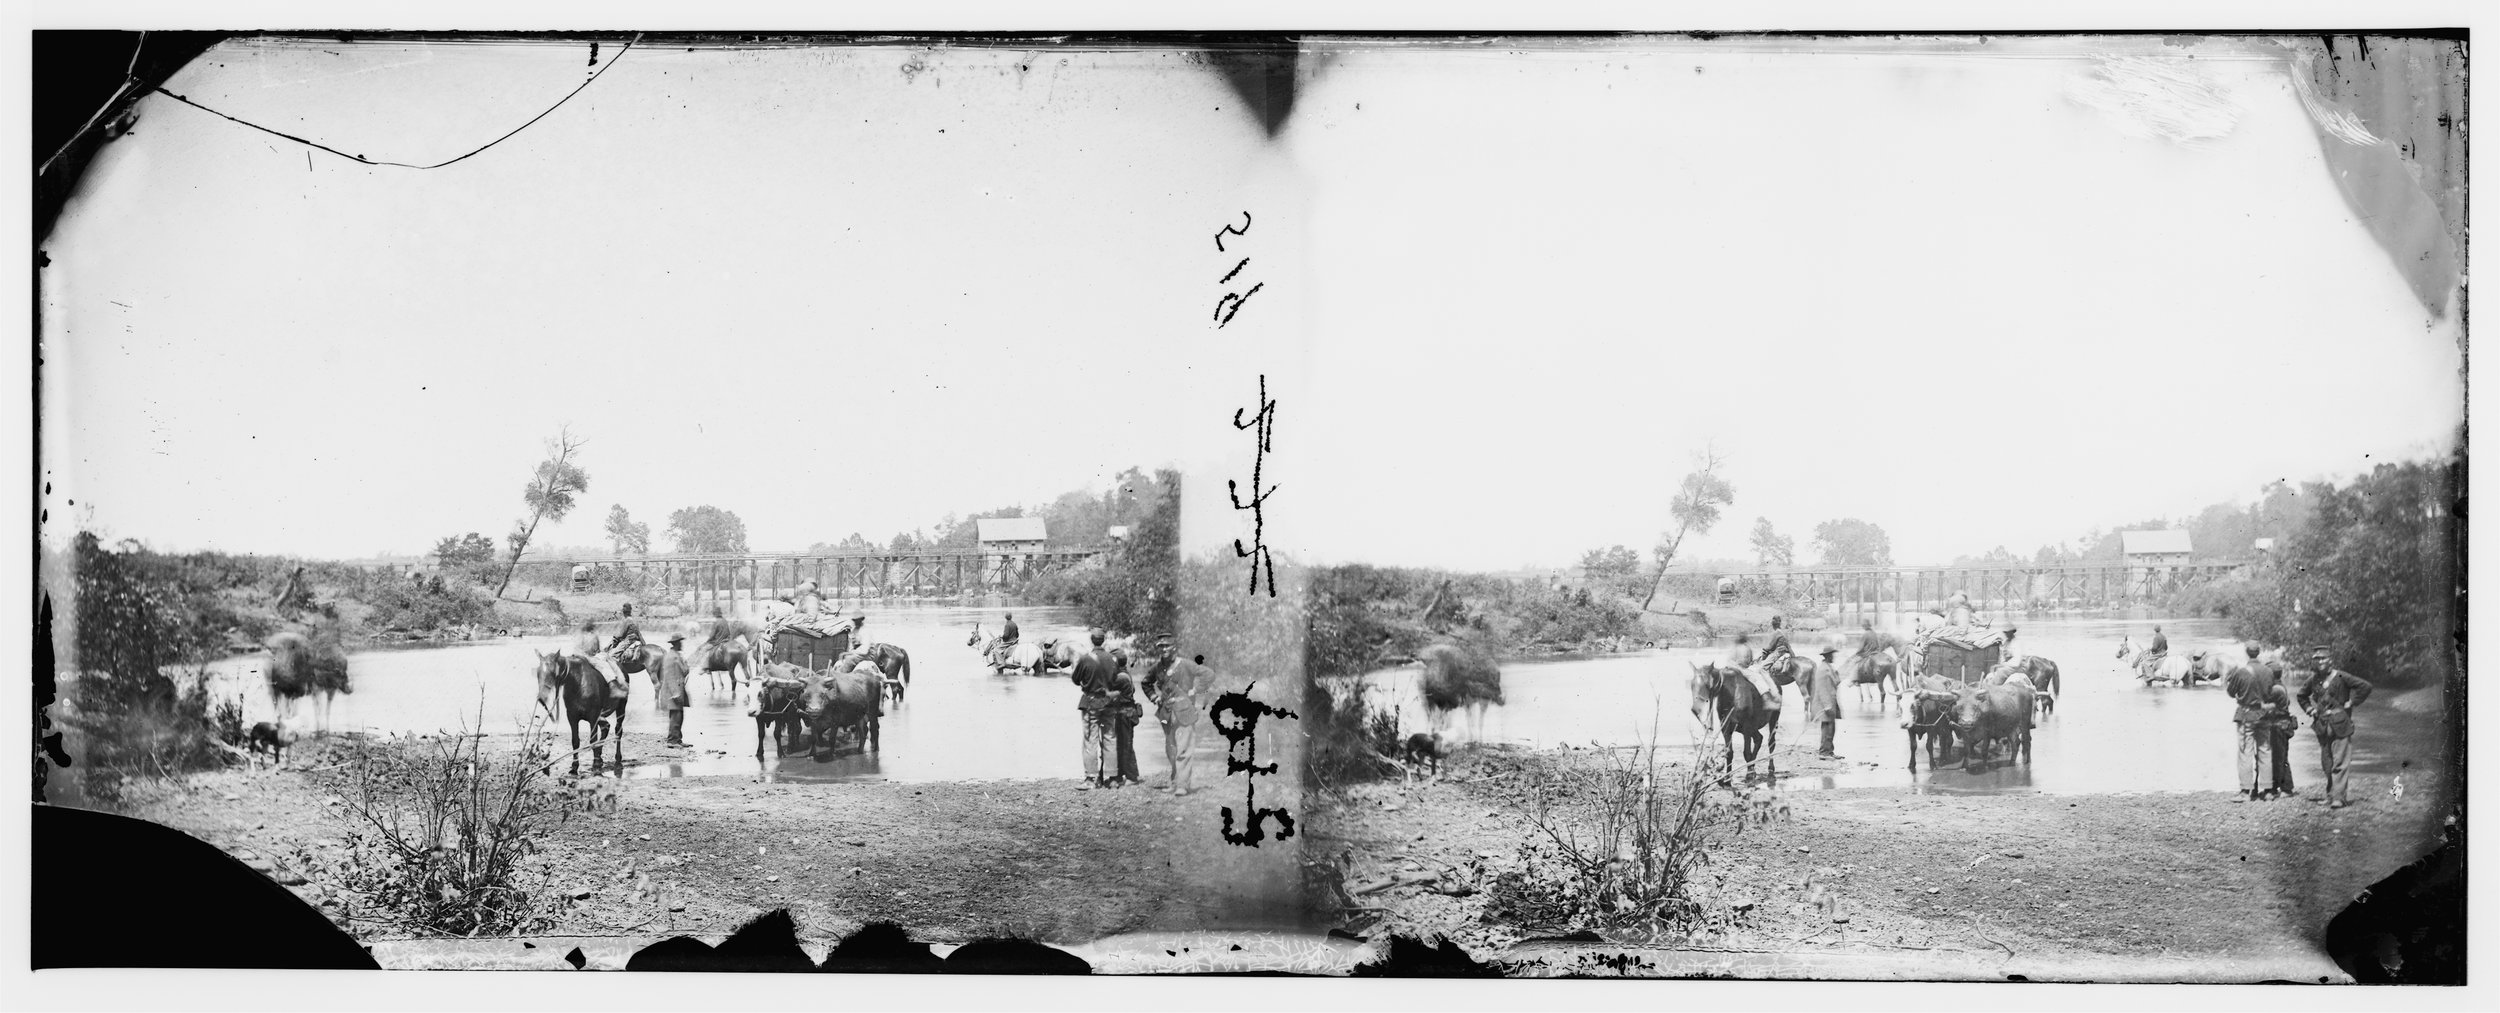 Self-Emancipation: Timothy H. O'Sullivan,  Rappahannock River, Virginia. Fugitive Negroes Fording the Rappahannock (During Pope's Retreat) . Timothy O'Sullivan, August 19, 1862. ( Library of Congress )